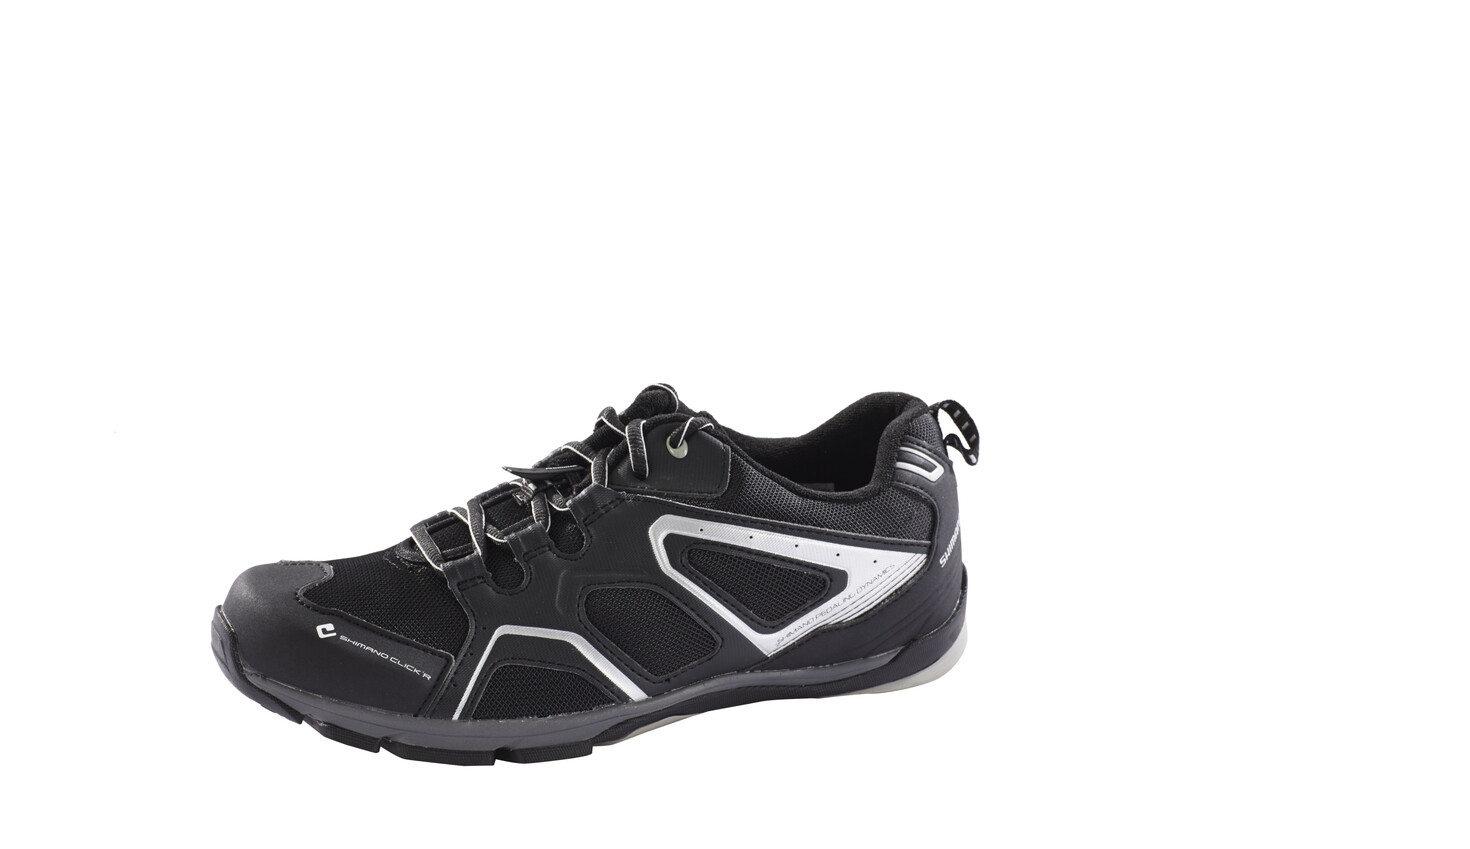 http://images.internetstores.de/products/351054/01/f37d87/Shimano_SH-CT40L_-_Chaussures_trekking_homme_-_noir_02[1470x849].jpg?forceSize=true&forceAspectRatio=true